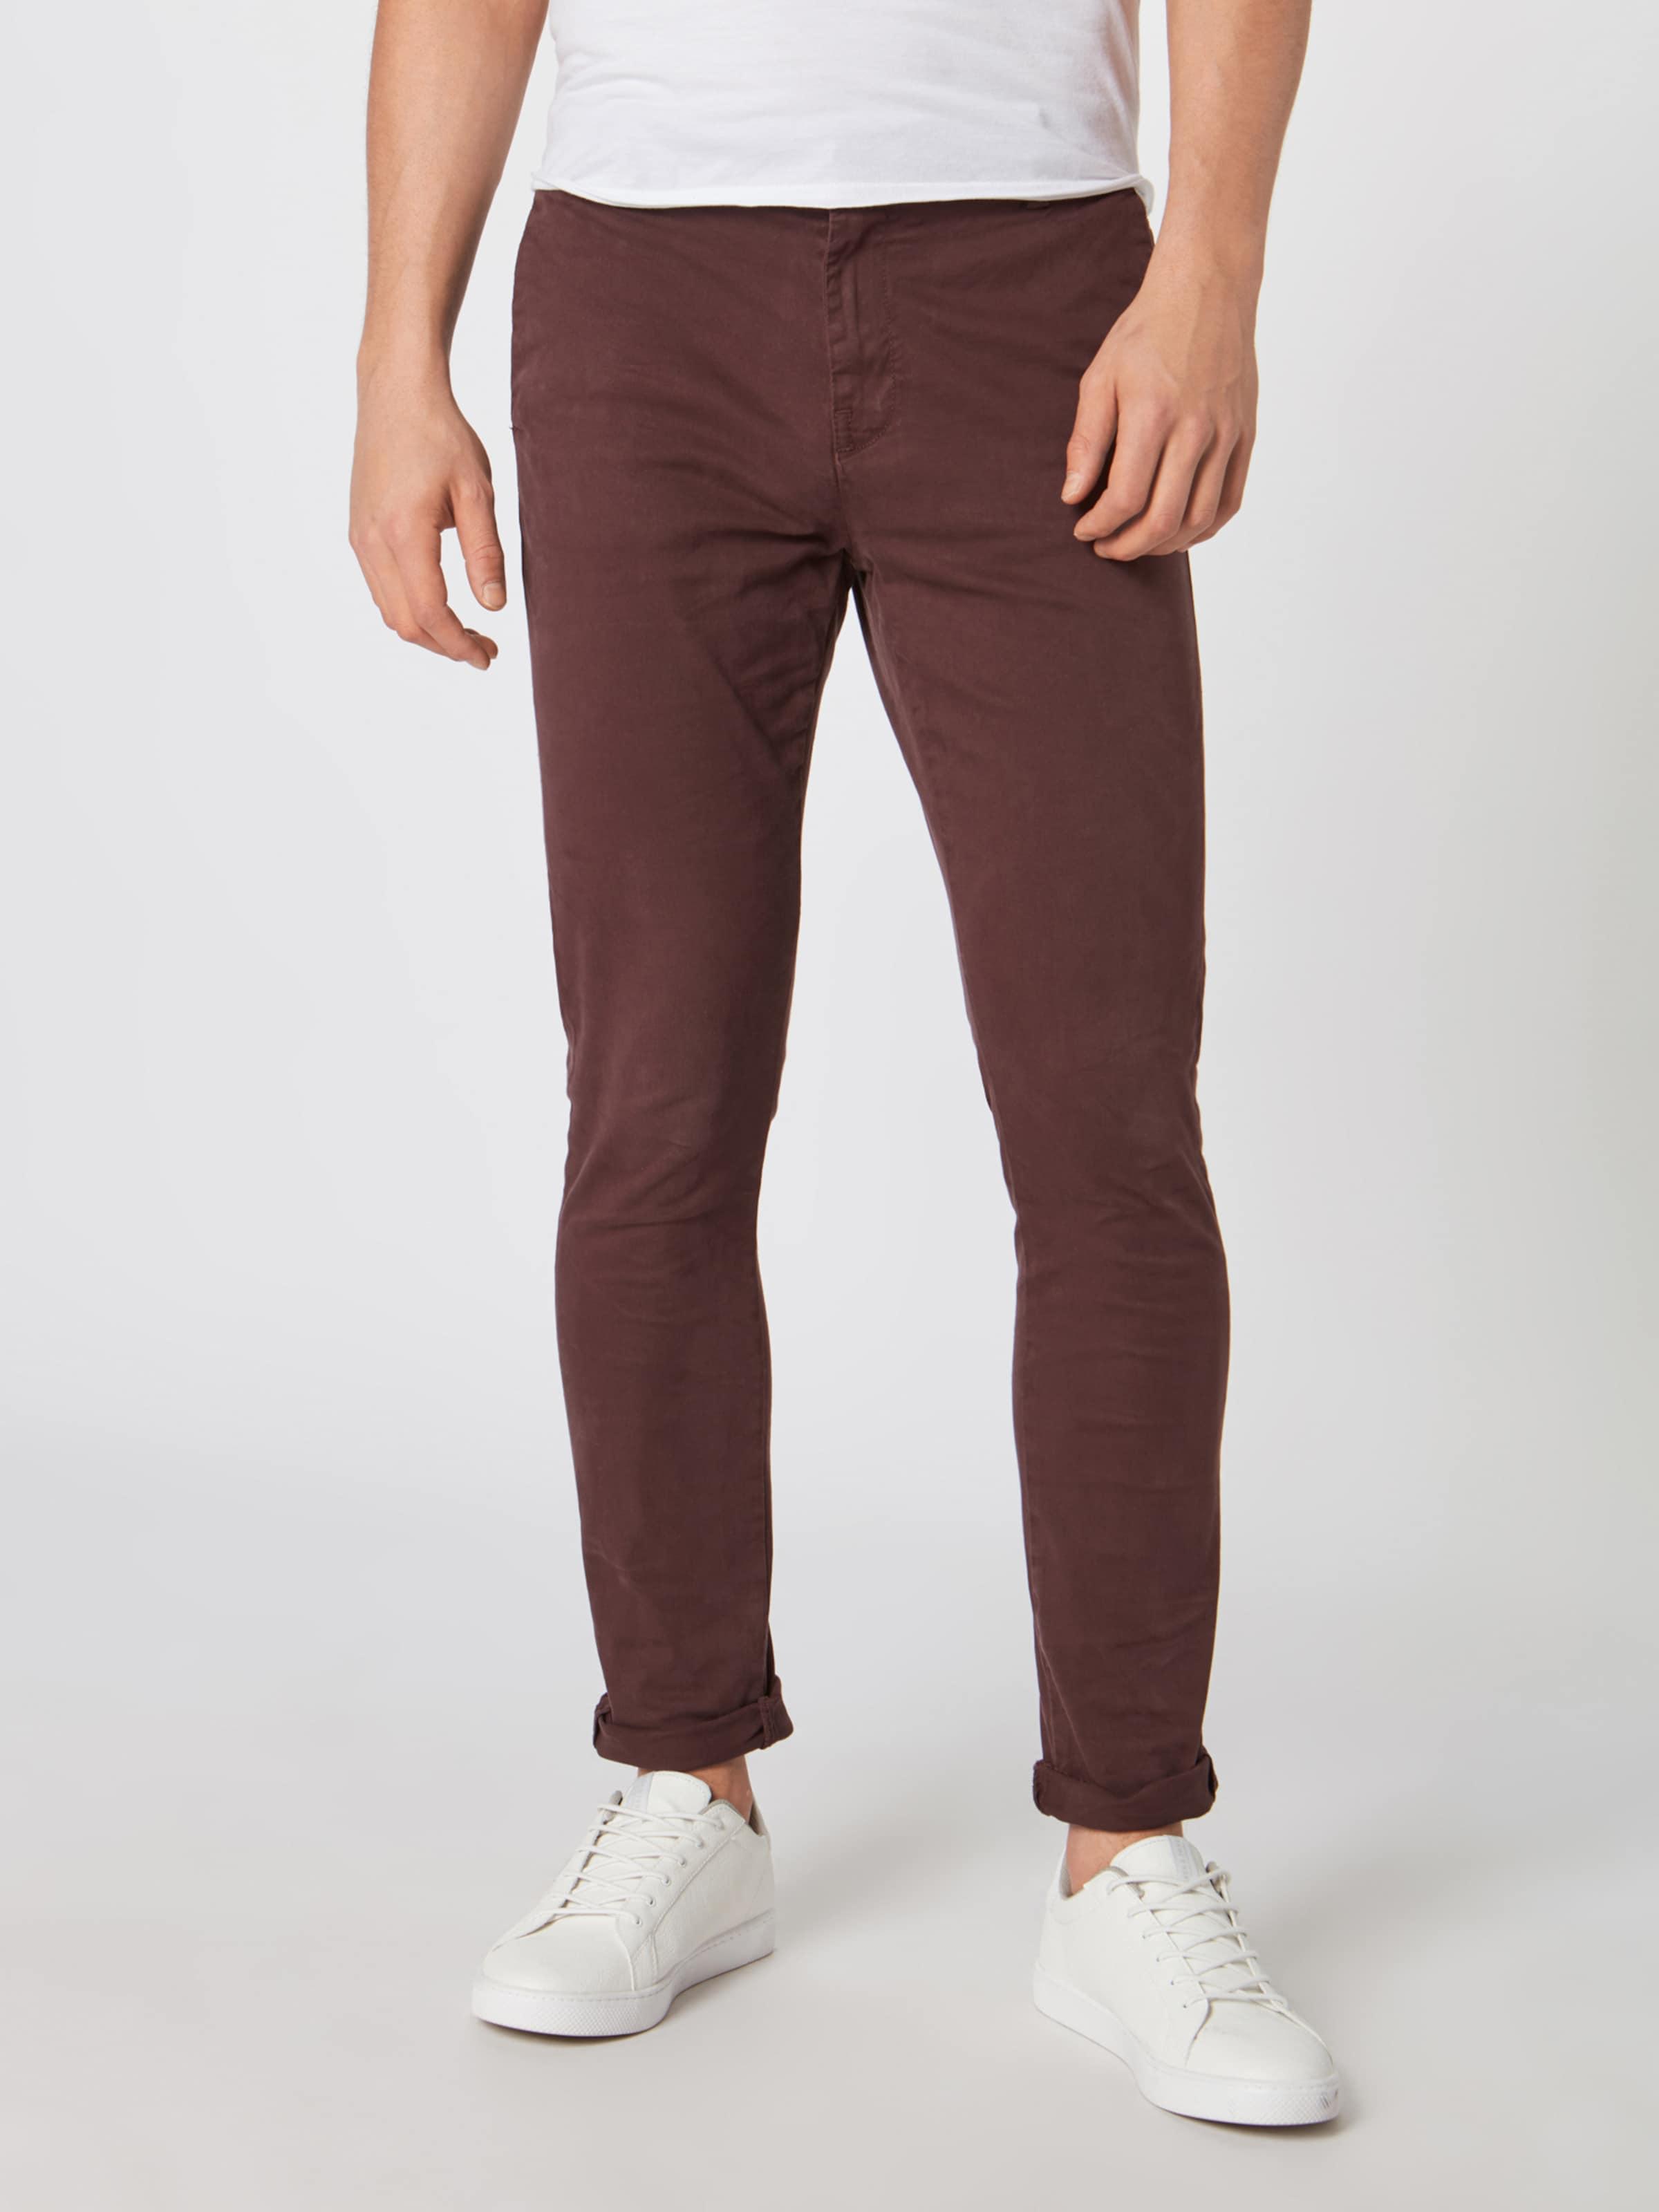 Look Bronze New Pantalon En Chino Nwyn0mv8O